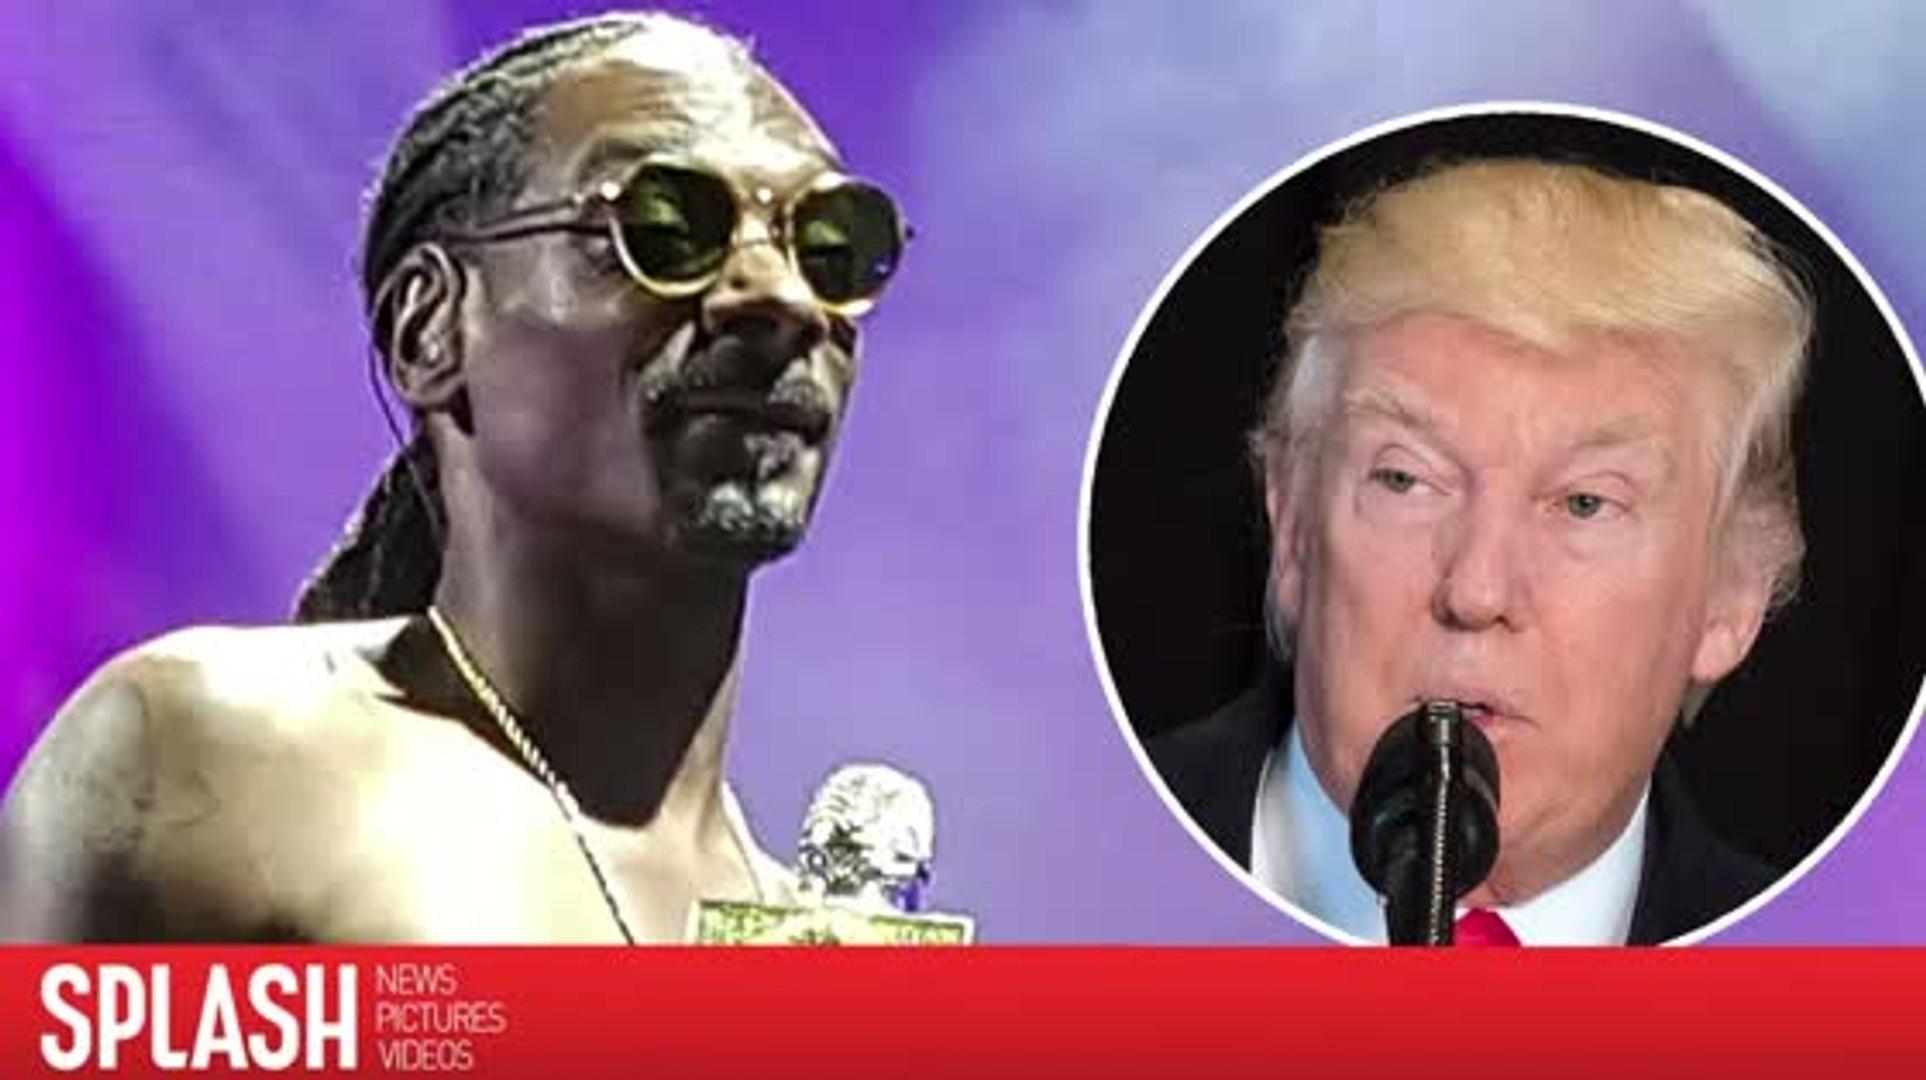 Snoop Dogg Parodies Donald Trump In New Music Video